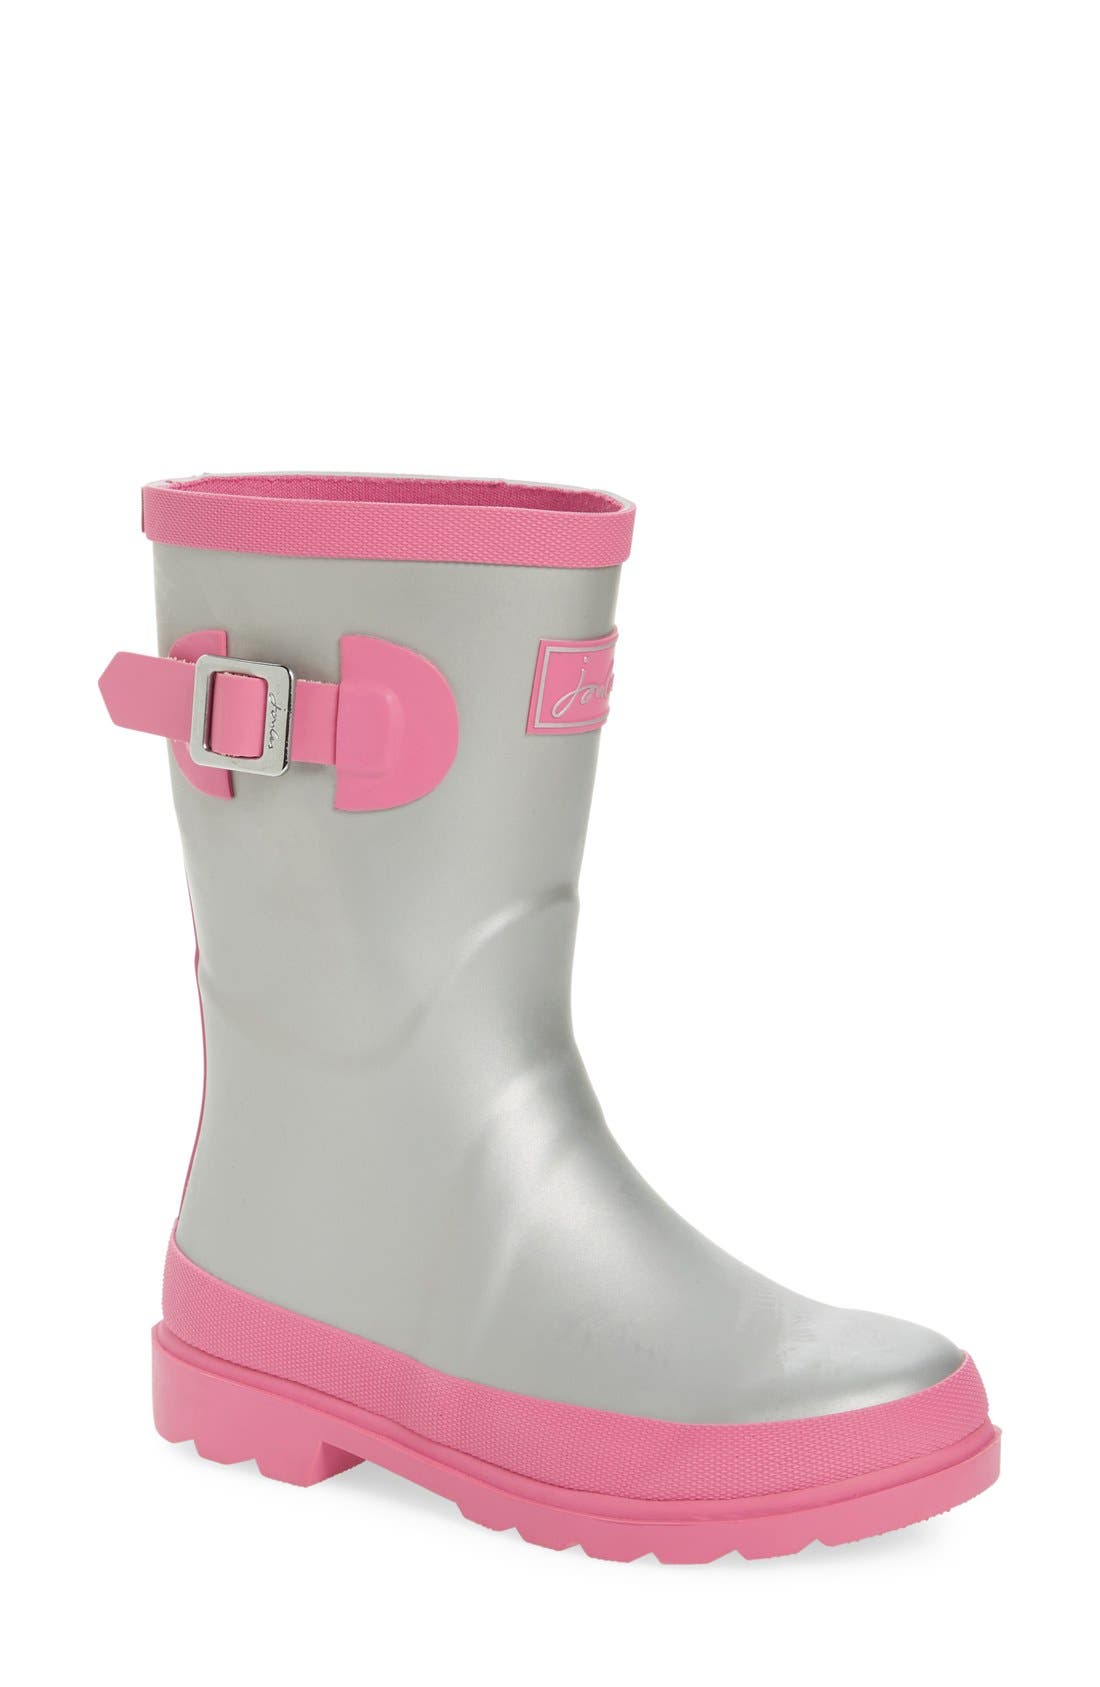 Field Welly Rain Boot,                             Main thumbnail 1, color,                             040